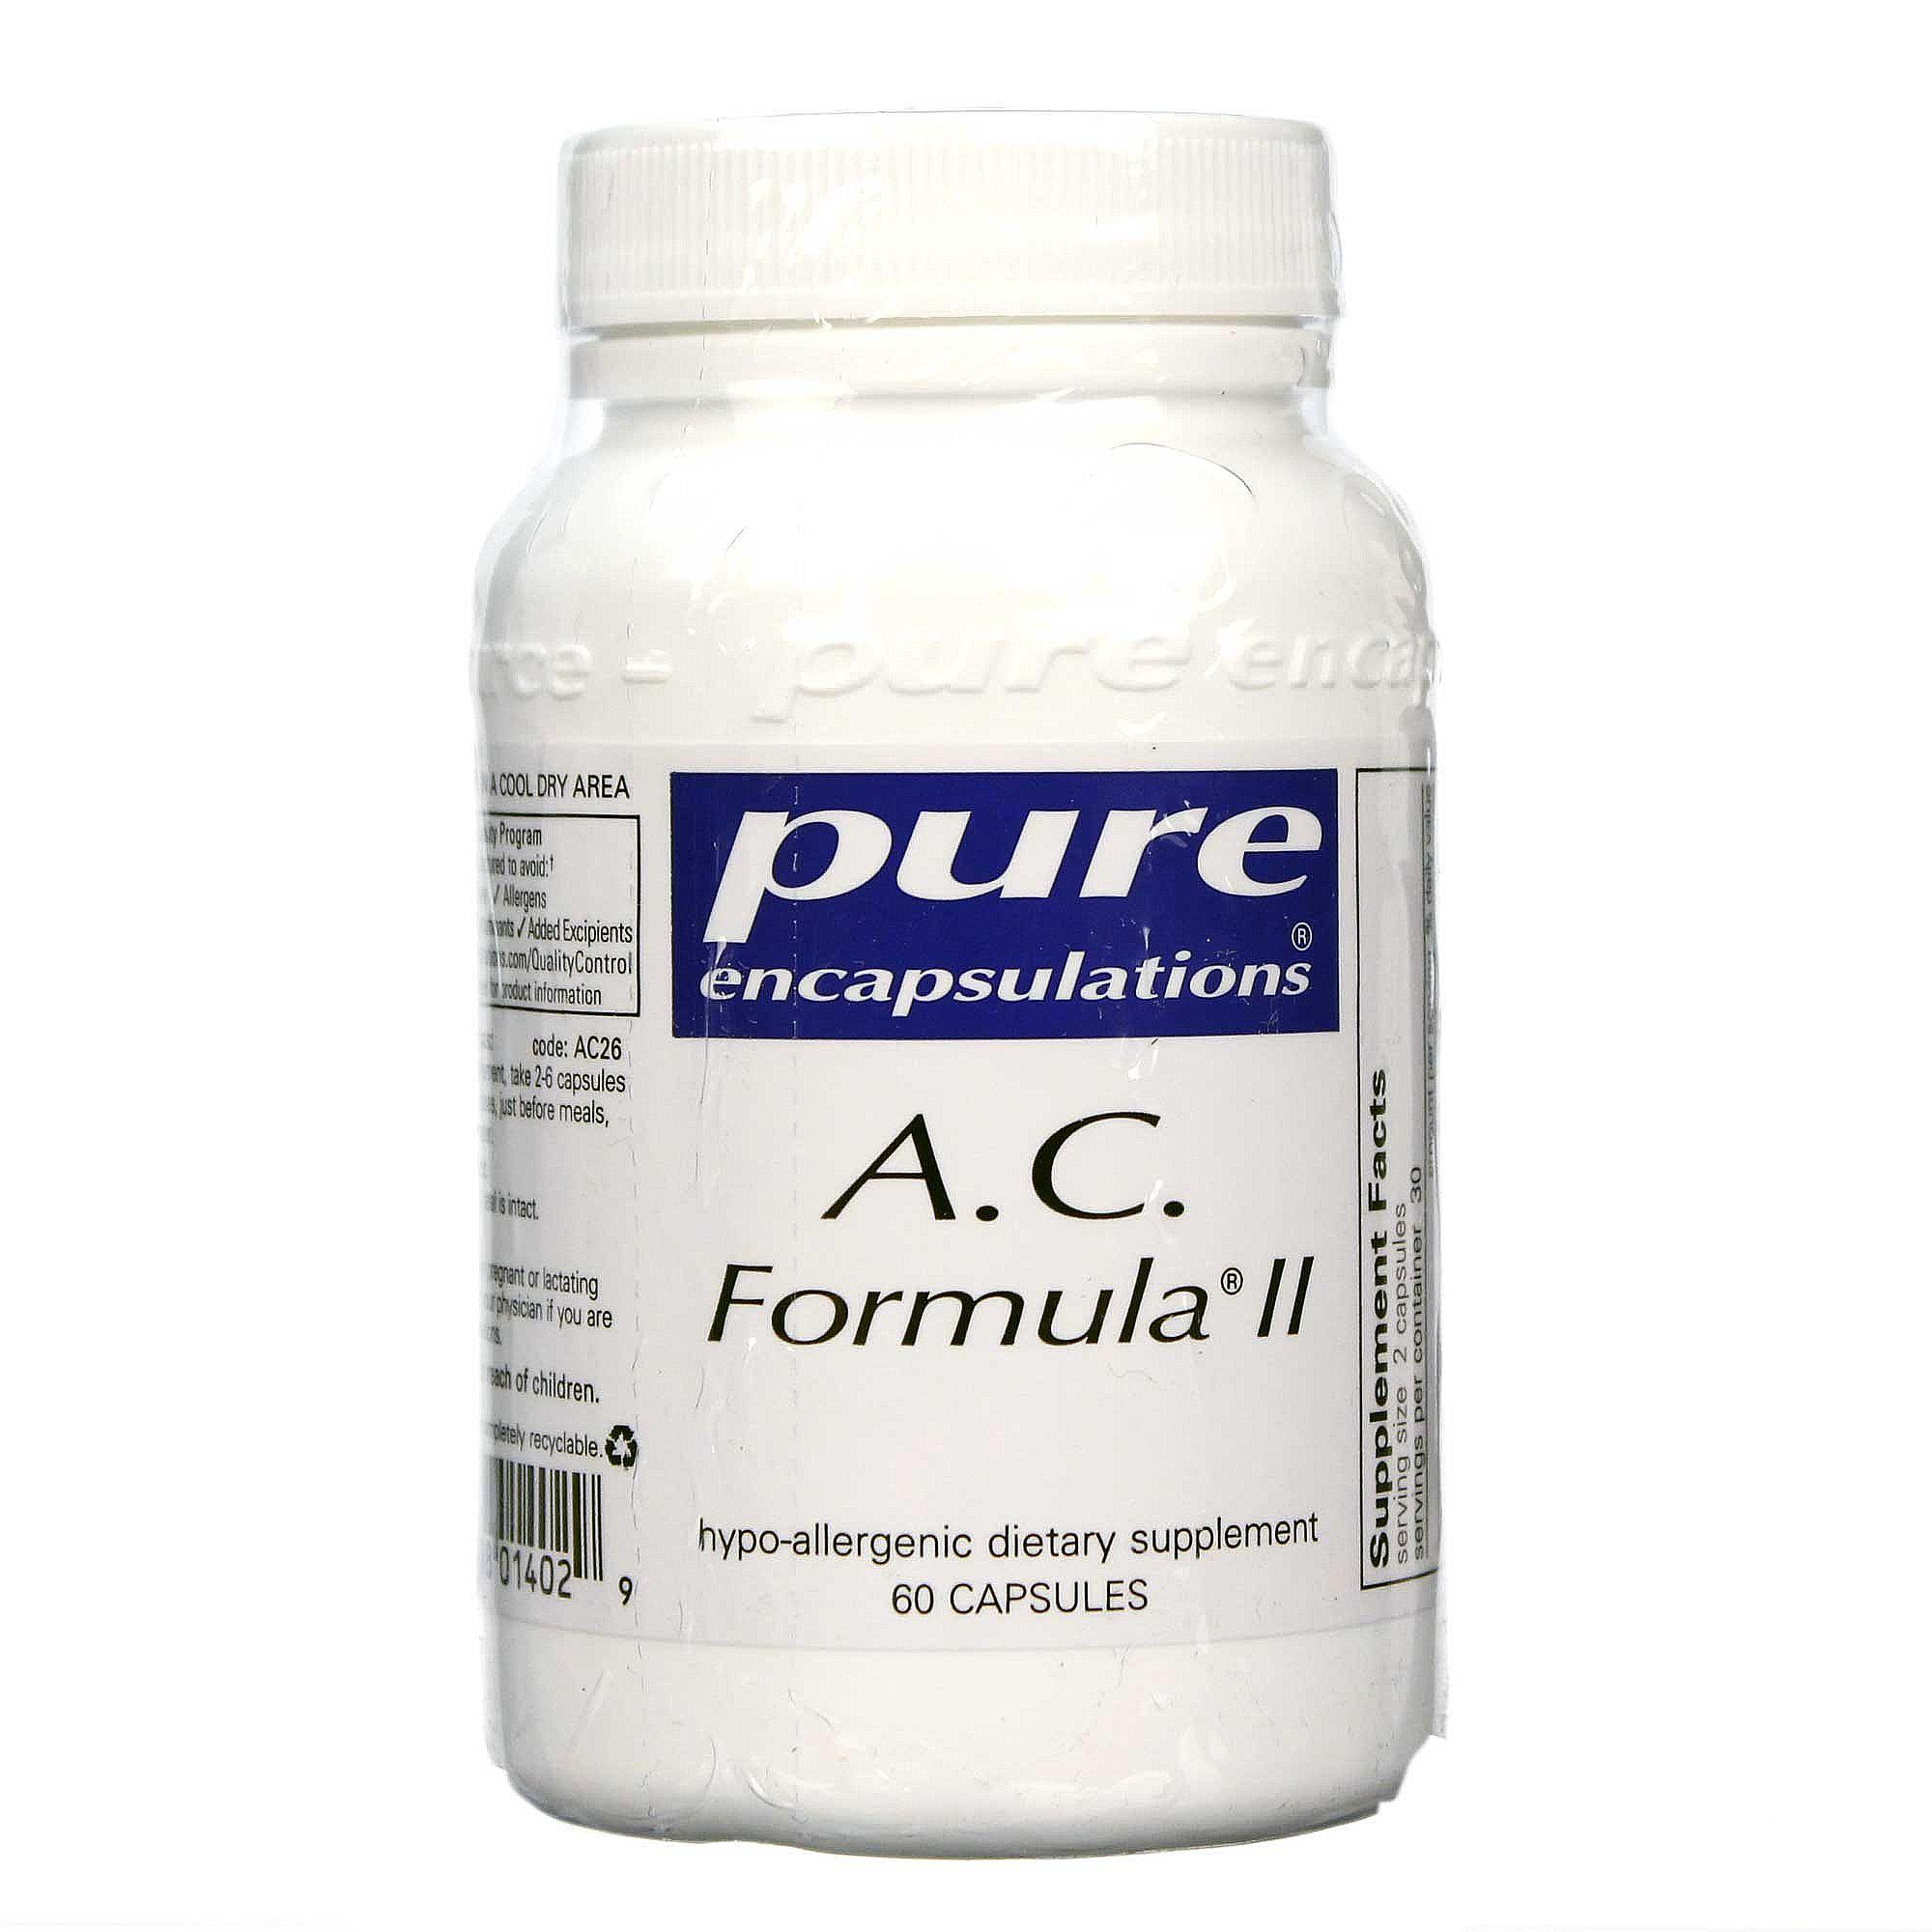 Pure Encapsulations Ac Formula Ii 60 Capsules